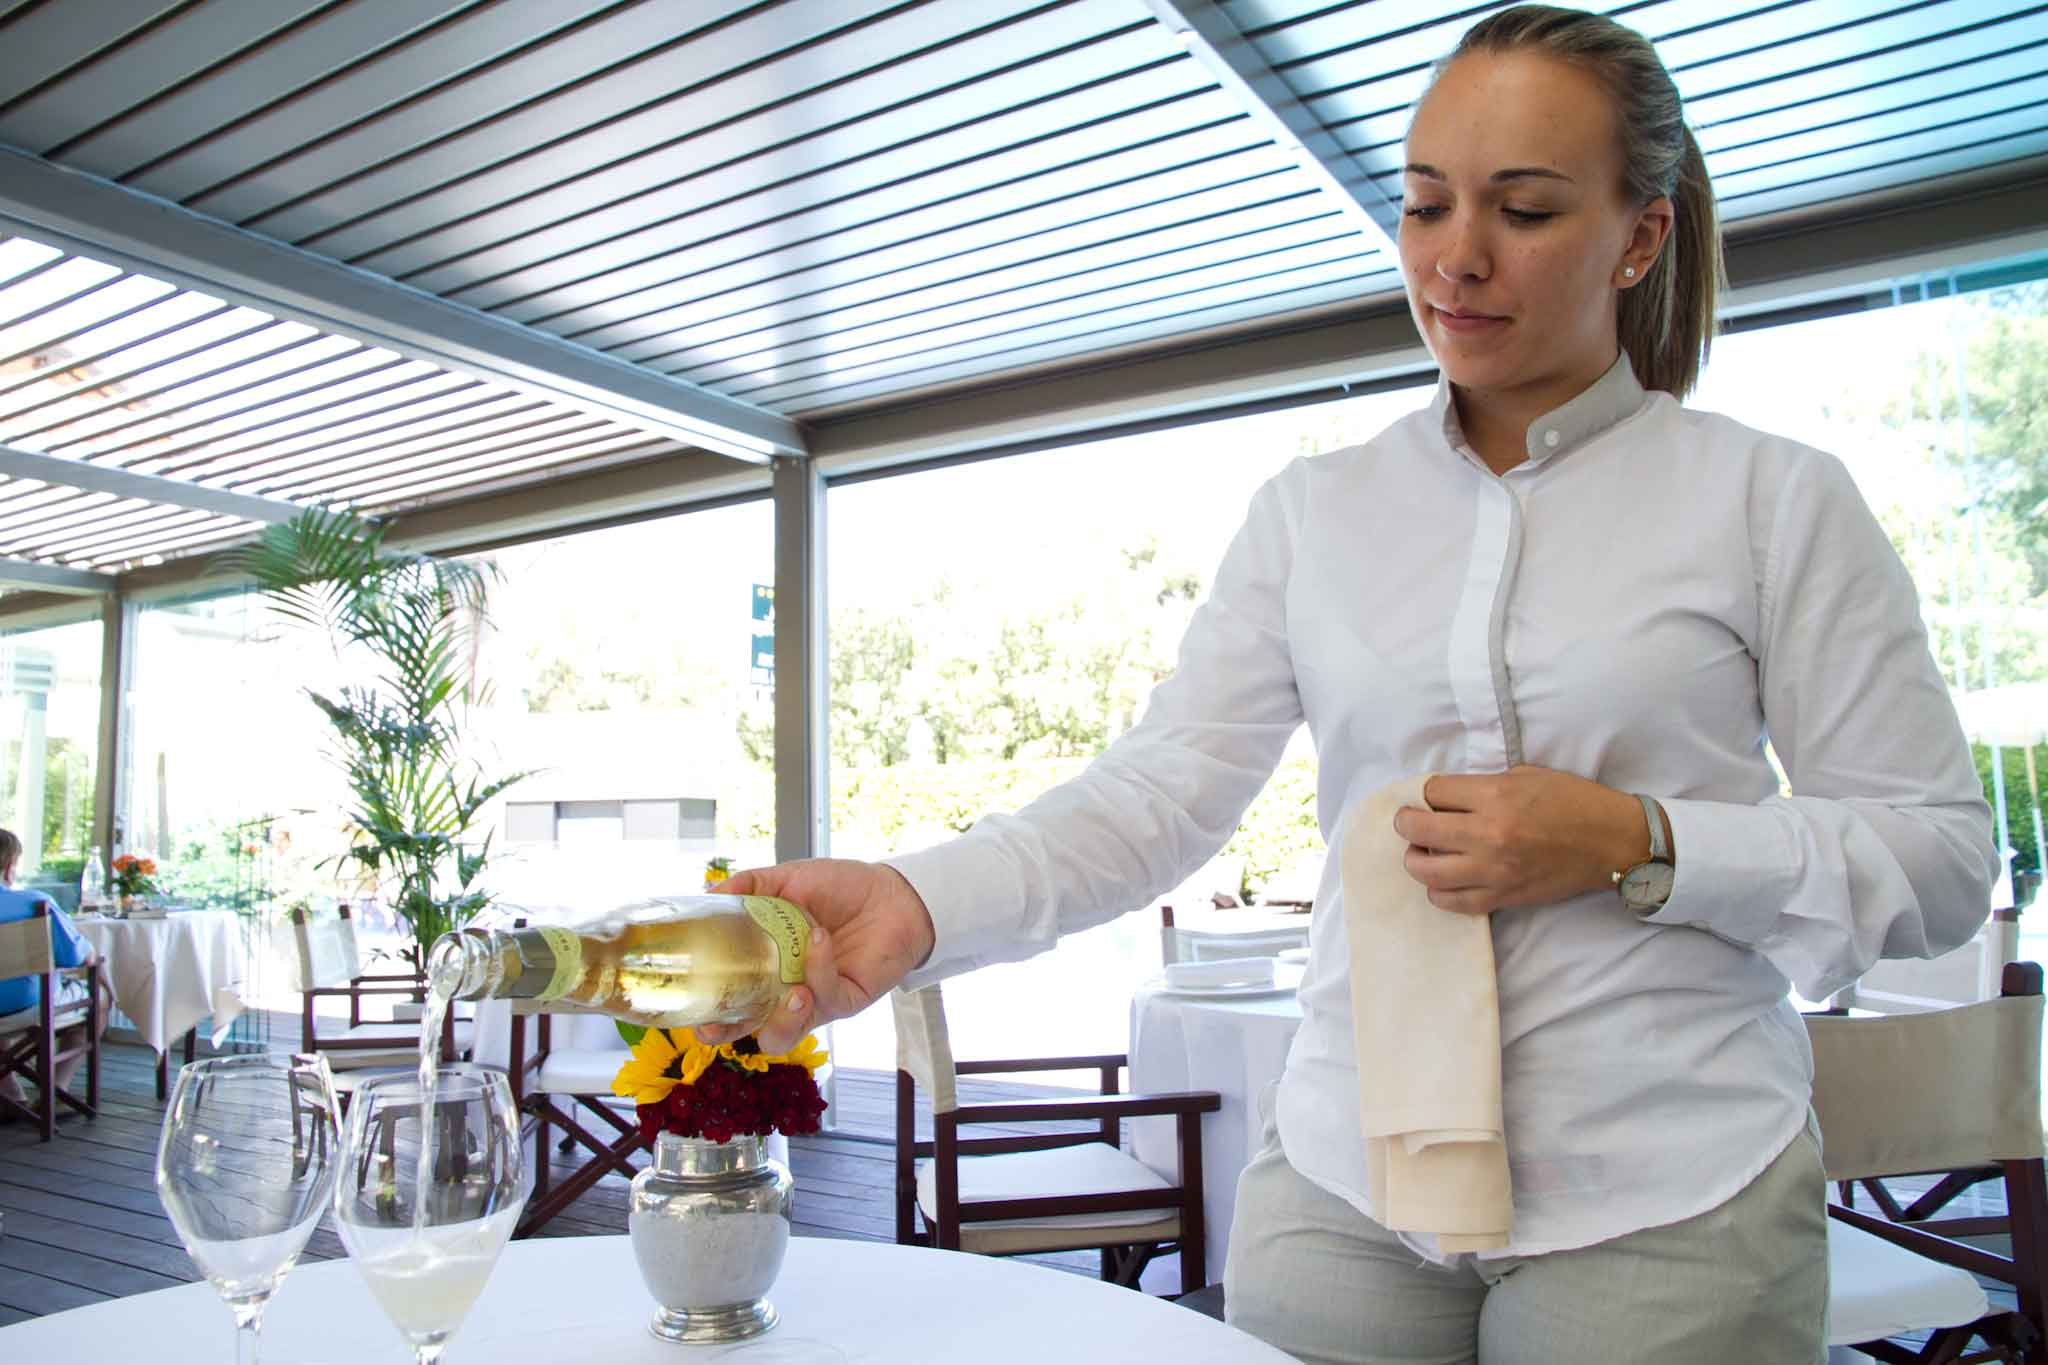 Sara Guastalla